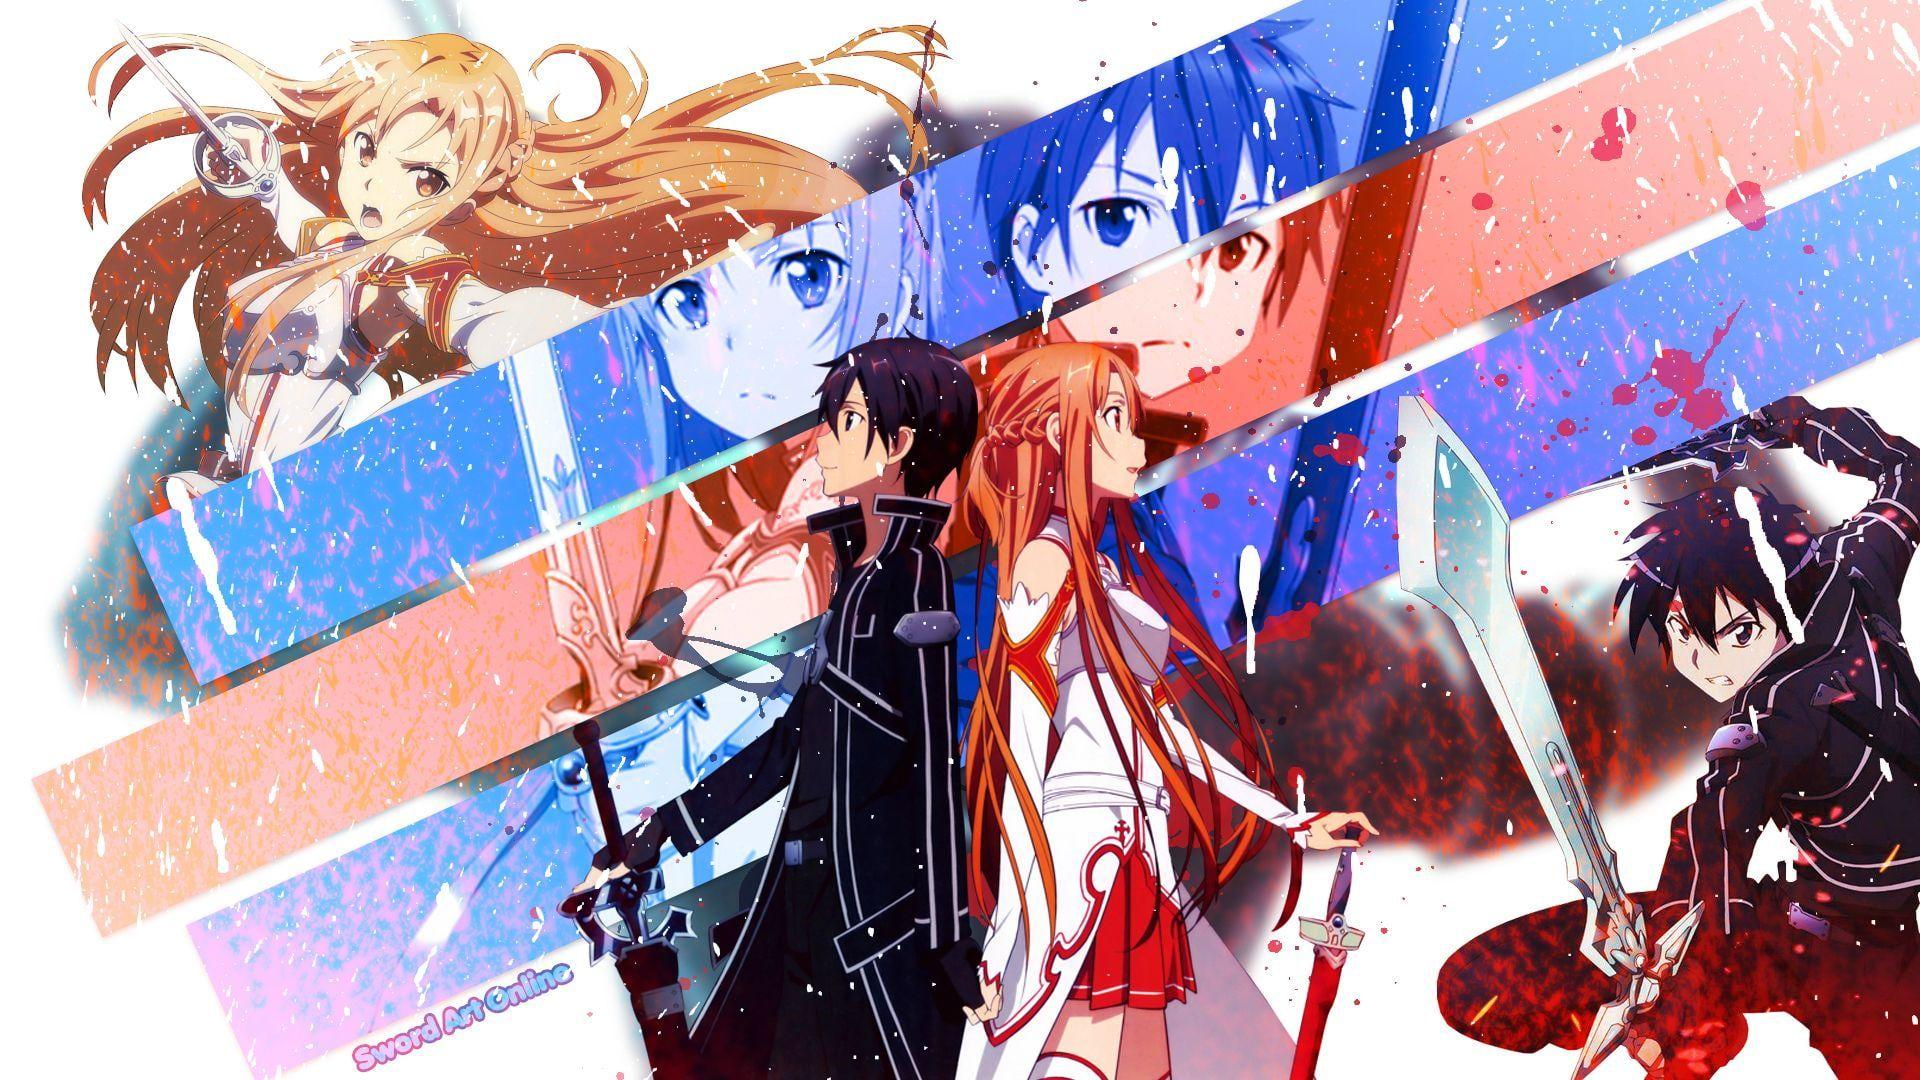 Sword Art Online Anime Girls Kirigaya Kazuto Yuuki Asuna 1080p Wallpaper Hdwallpap In 2020 Sword Art Online Wallpaper Sword Art Online Kirito Sword Art Online Yuuki